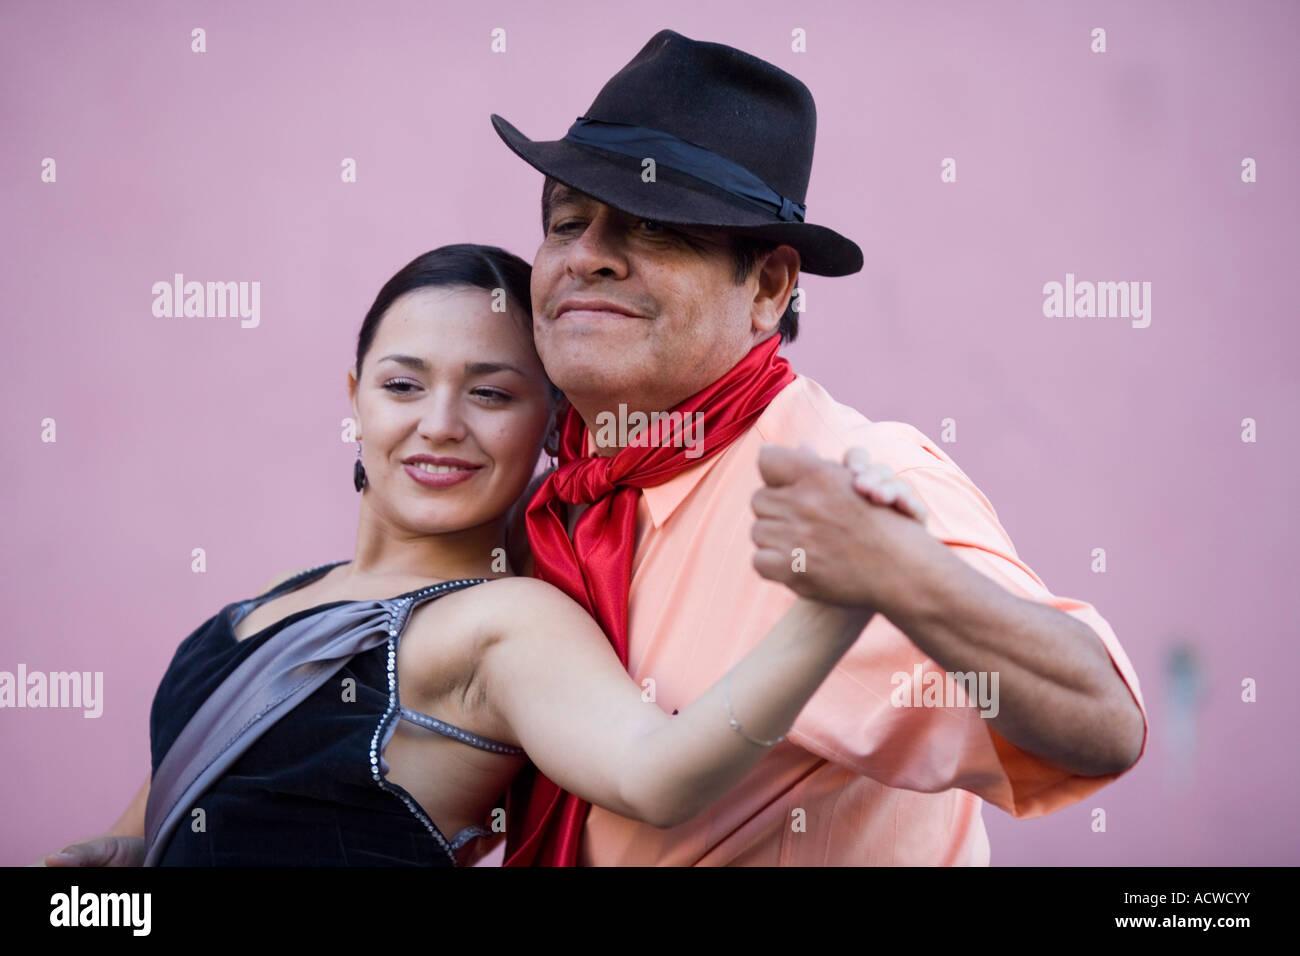 Pareja de bailarines de tango en Buenos Aires Argentina Imagen De Stock